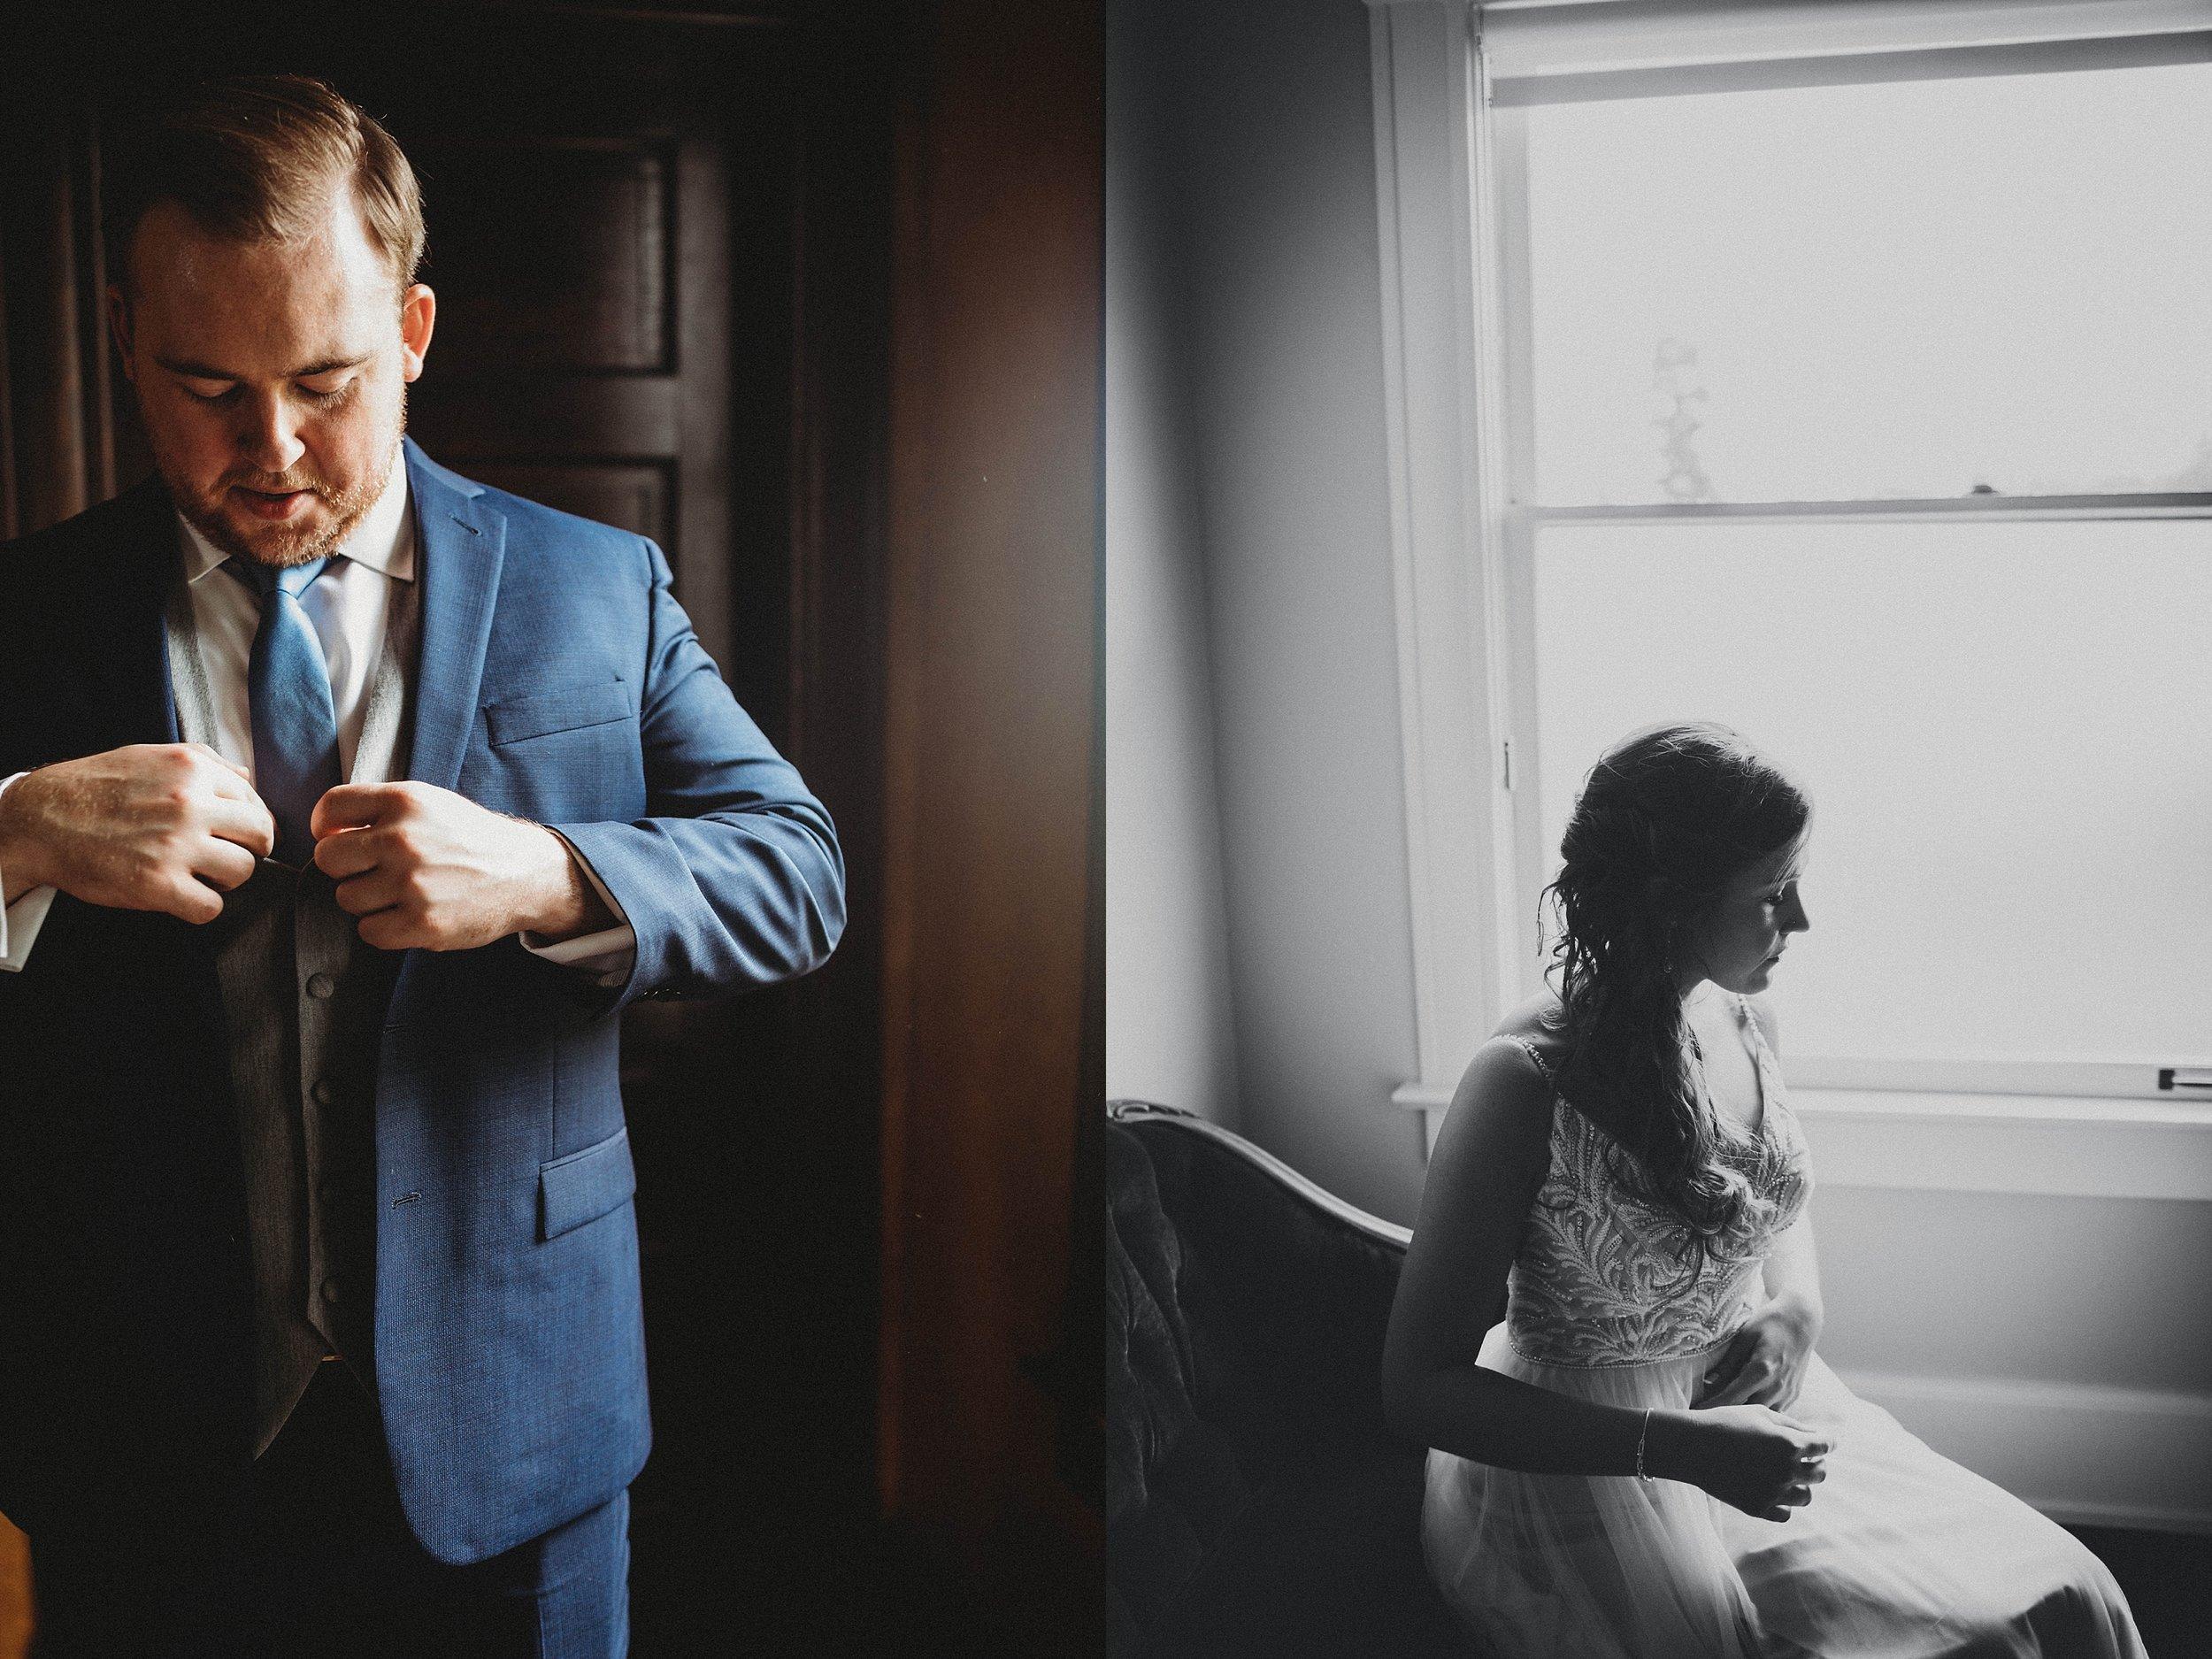 olson mansion wedding photography - jill and garrett - ashley vos photography - seattle area wedding photographer-19.jpg